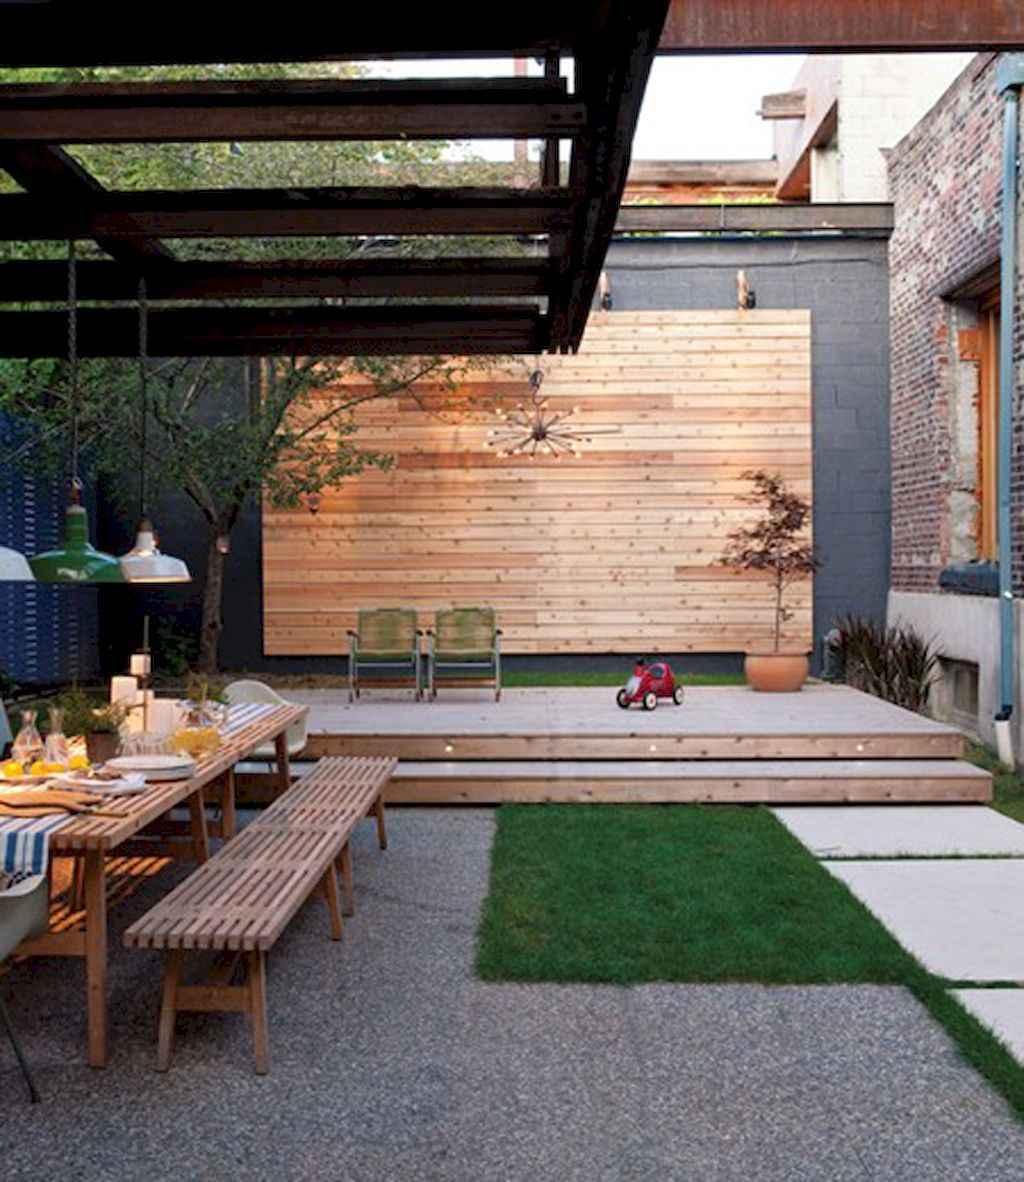 60 Fresh Backyard Landscaping Design Ideas on A Budget (50)